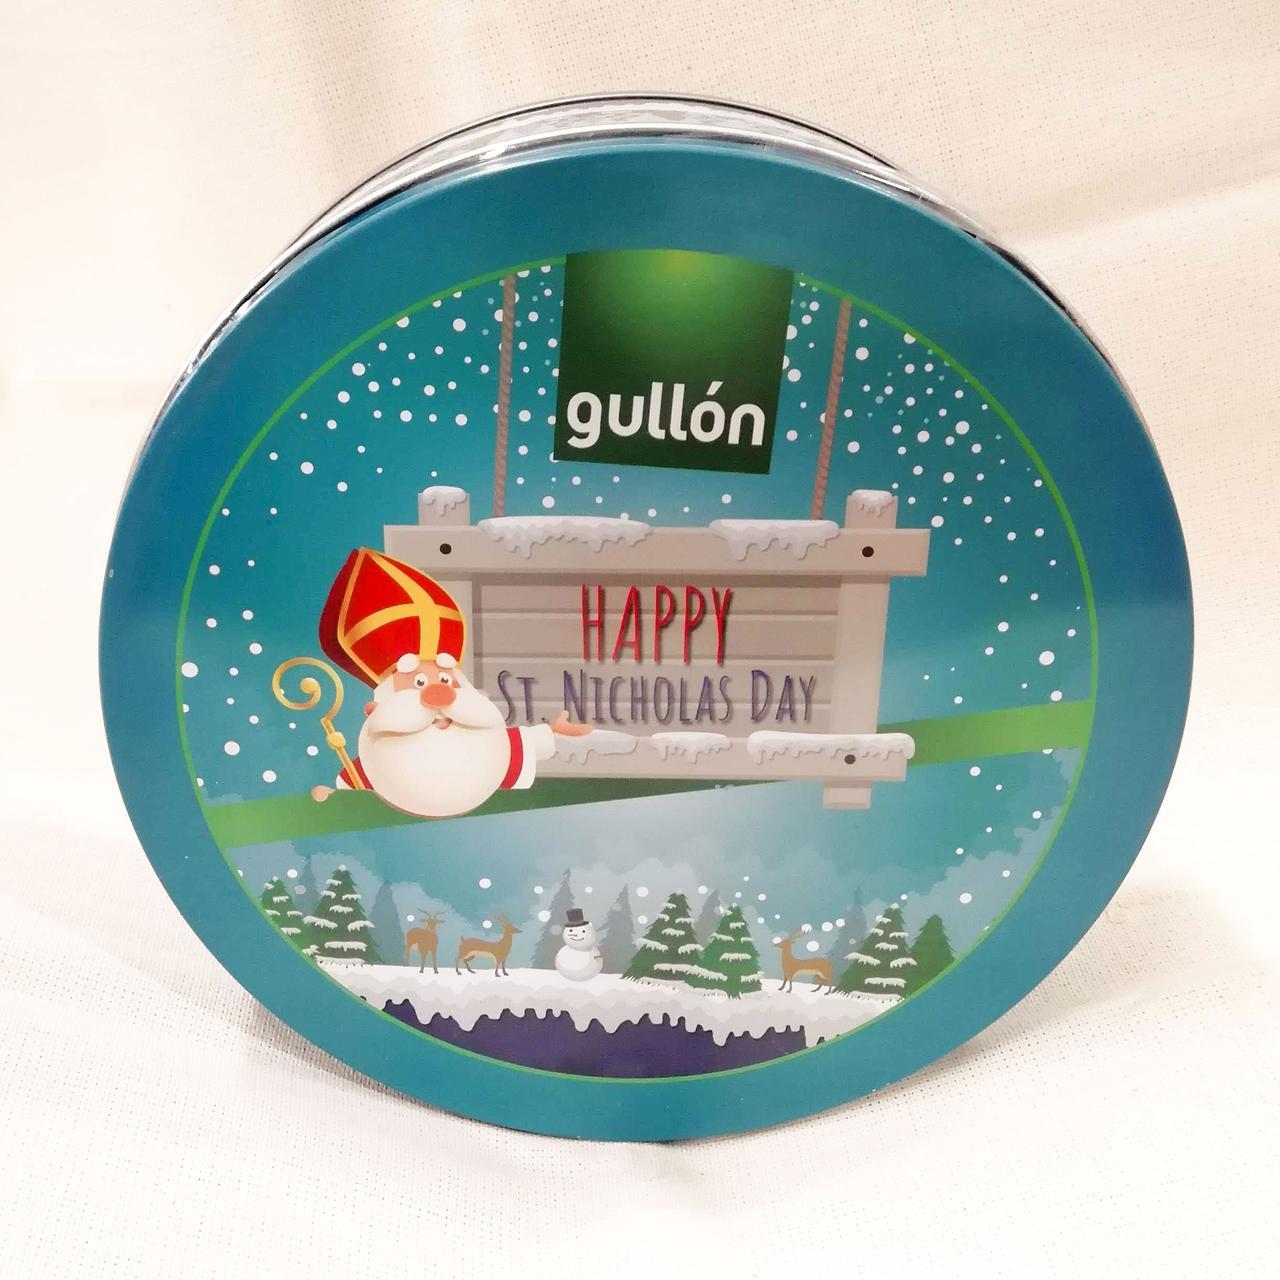 Gullon Happy St. Nicholas Day